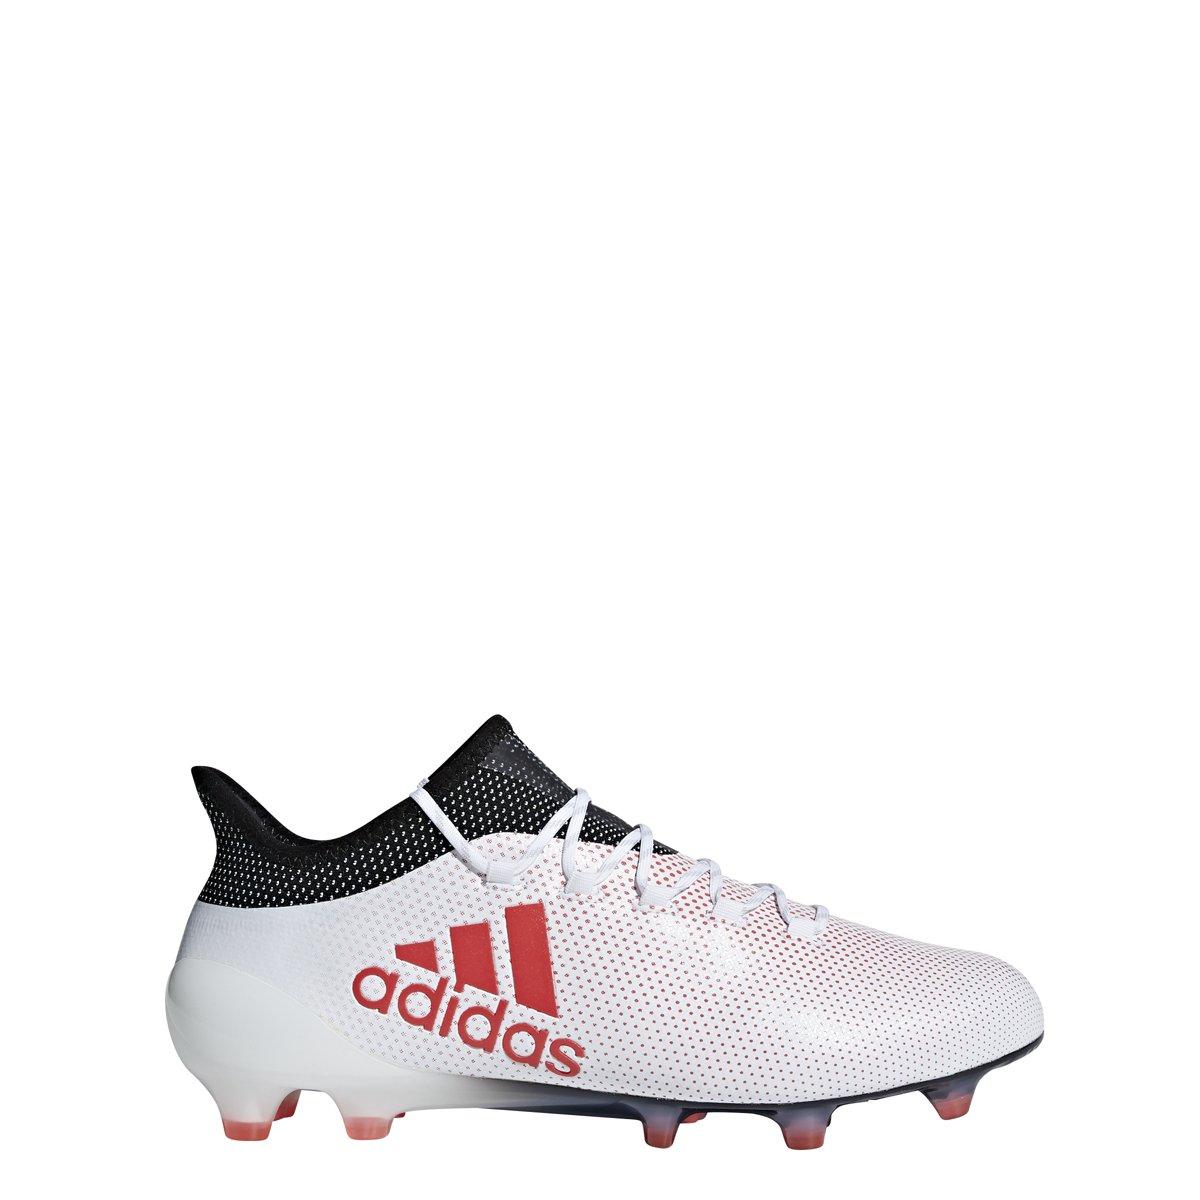 b86d60f16cfaf Amazon.com | adidas X 17.1 Men's Firm Ground Soccer Cleats (10 D(M ...